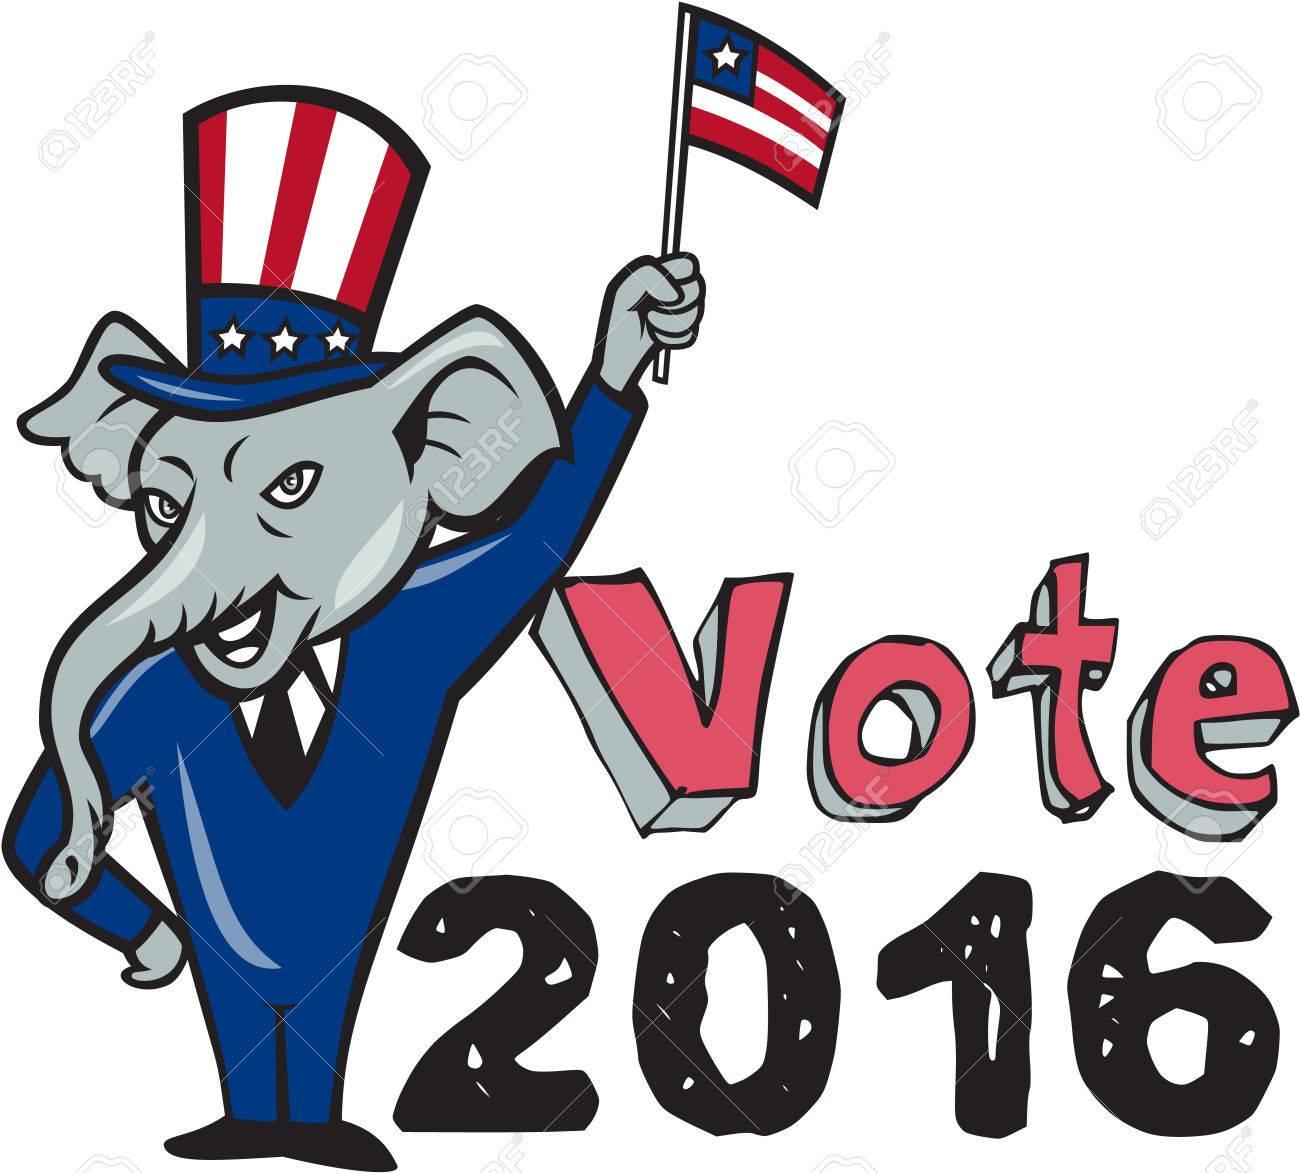 http://previews.123rf.com/images/patrimonio/patrimonio1510/patrimonio151000099/47009453-Illustration-of-a-republican-elephant-mascot-of-the-republican-grand-old-party-gop-smiling-looking-t-Stock-Vector.jpg